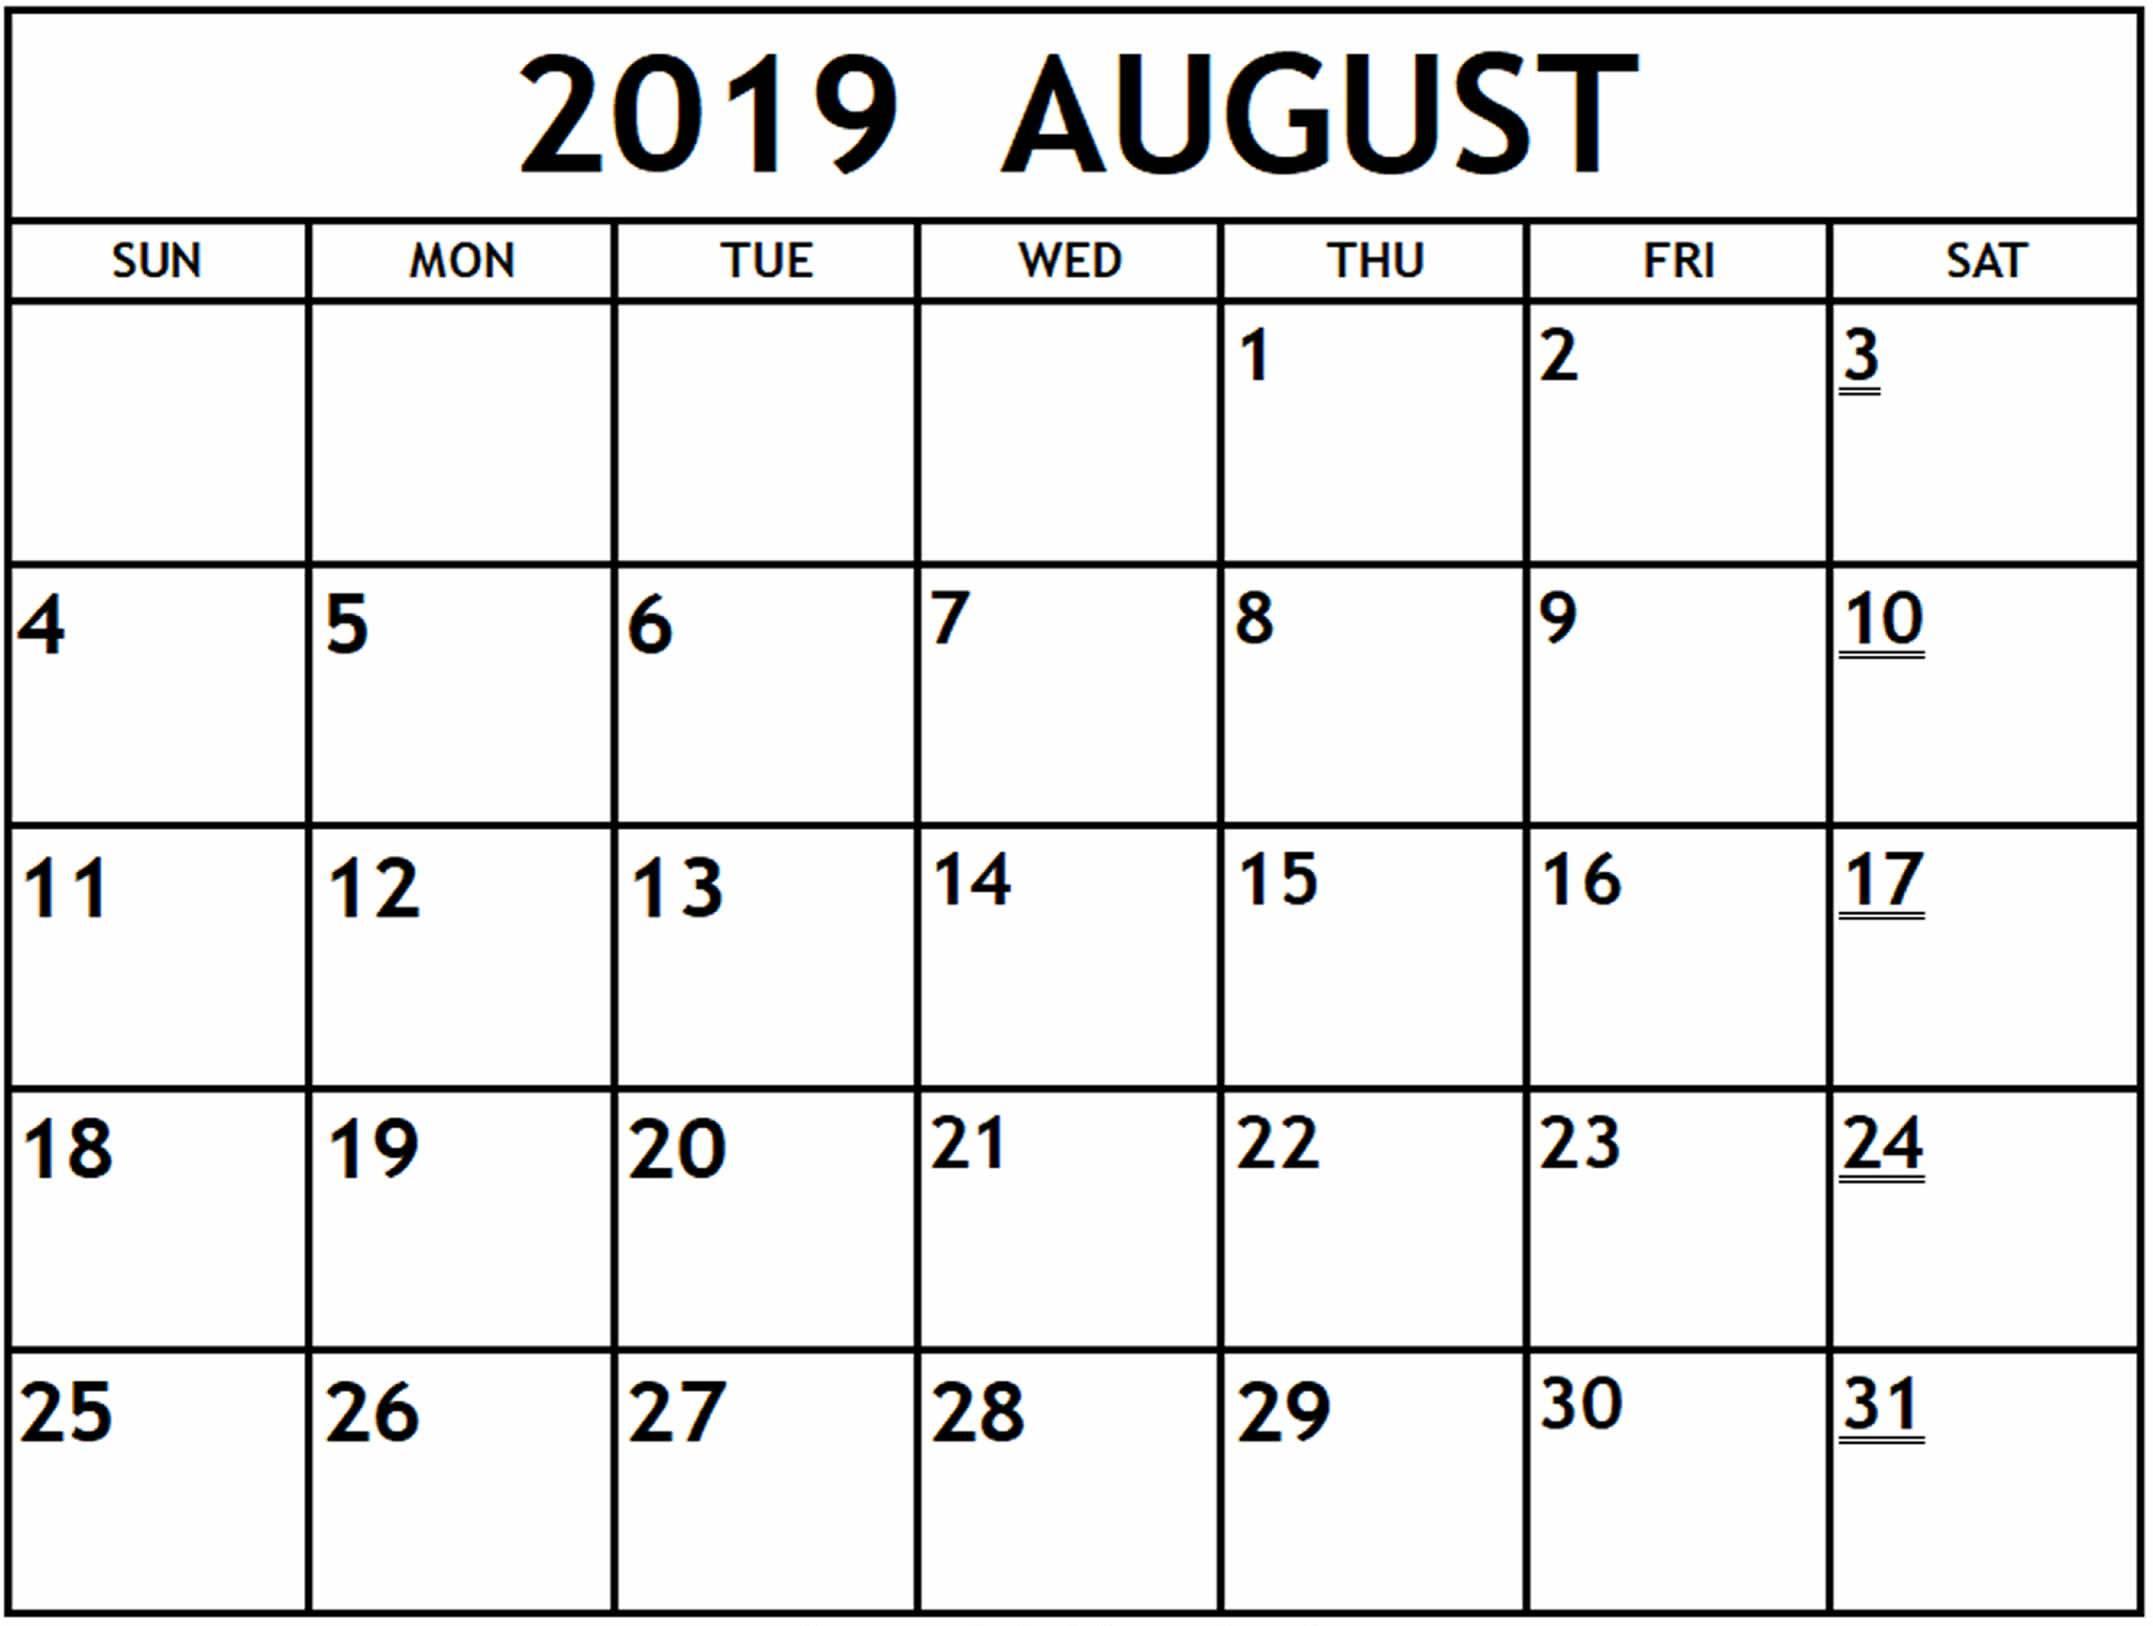 August Printable Calendar Template For 2019 – Magic Calendar 2019 intended for August Calendar Template Printable